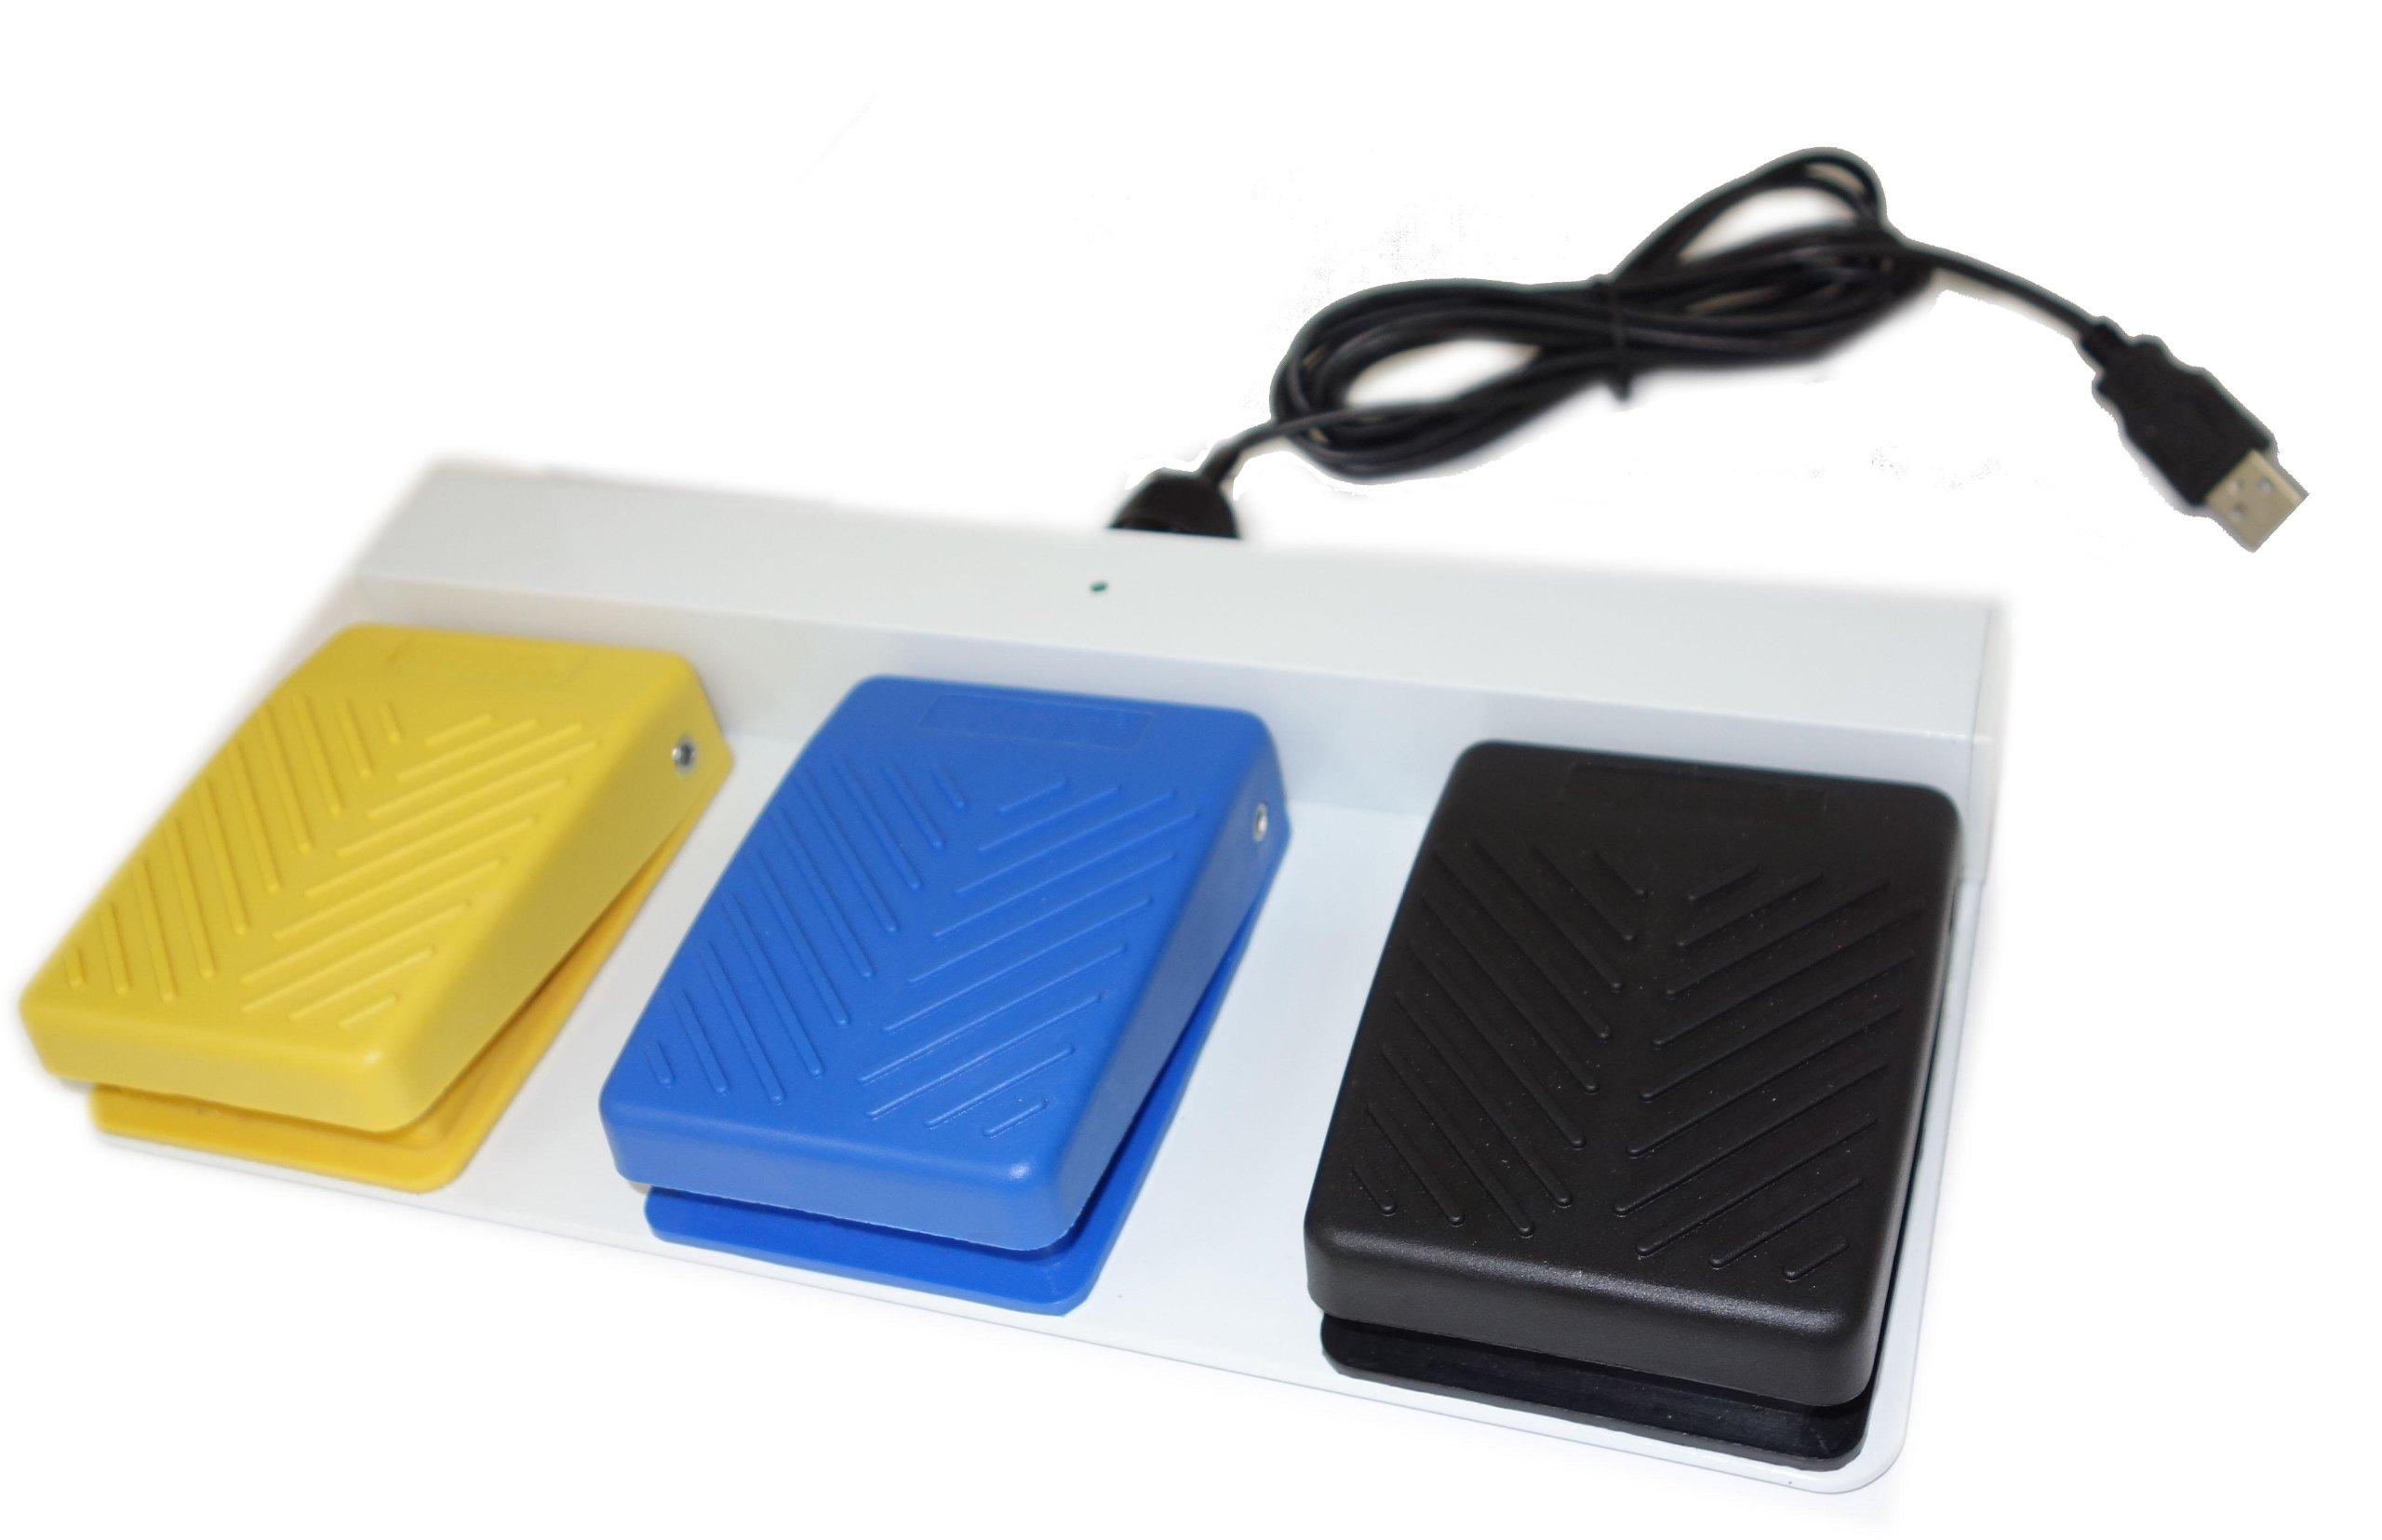 SUNS FS-81-SP-USB (3-Pedal) UL Certified USB Waterproof Three Pedal Medical Foot Switch